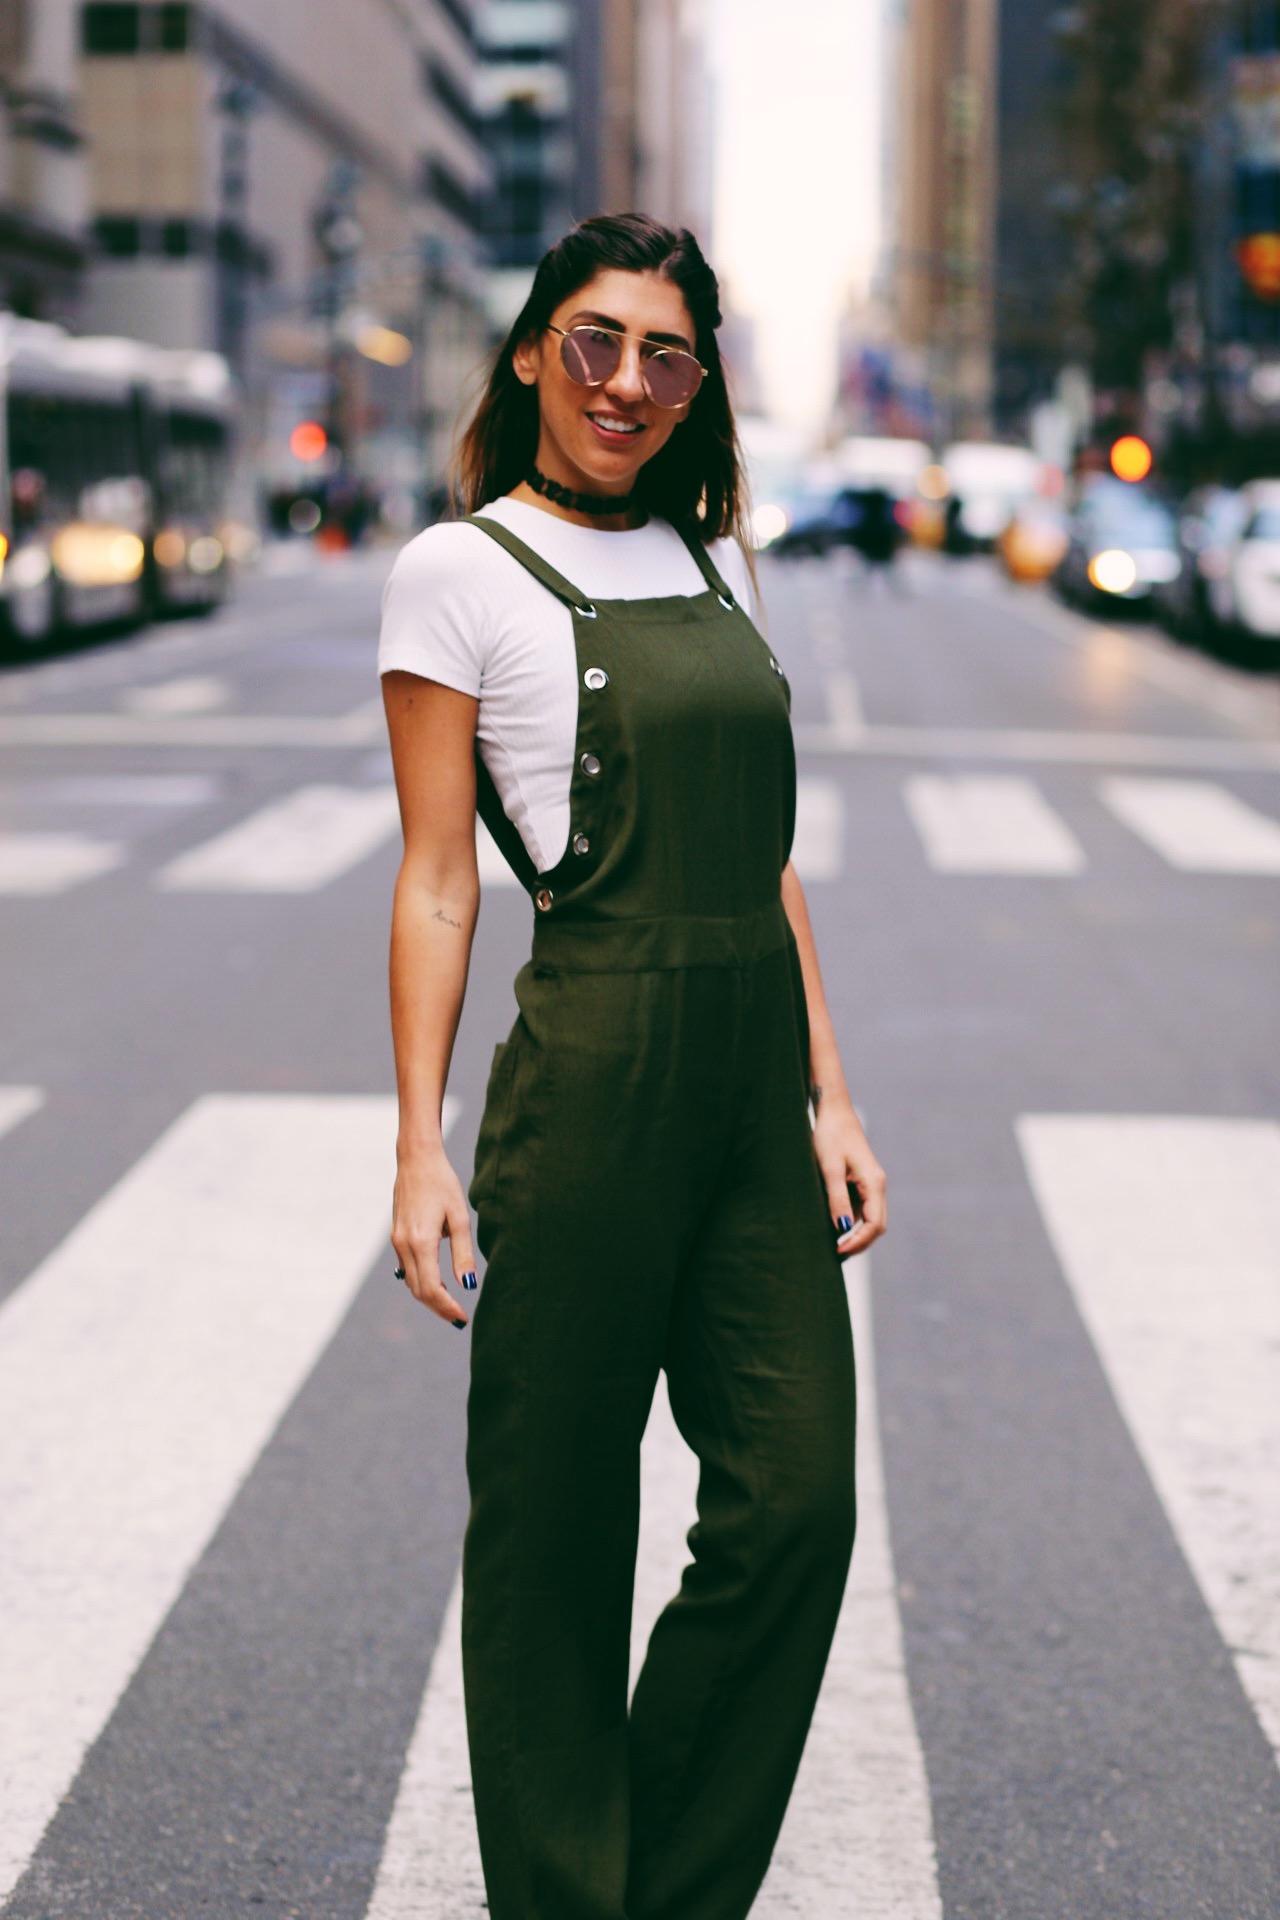 Lu D'Angelo  na semana da moda de Nova York